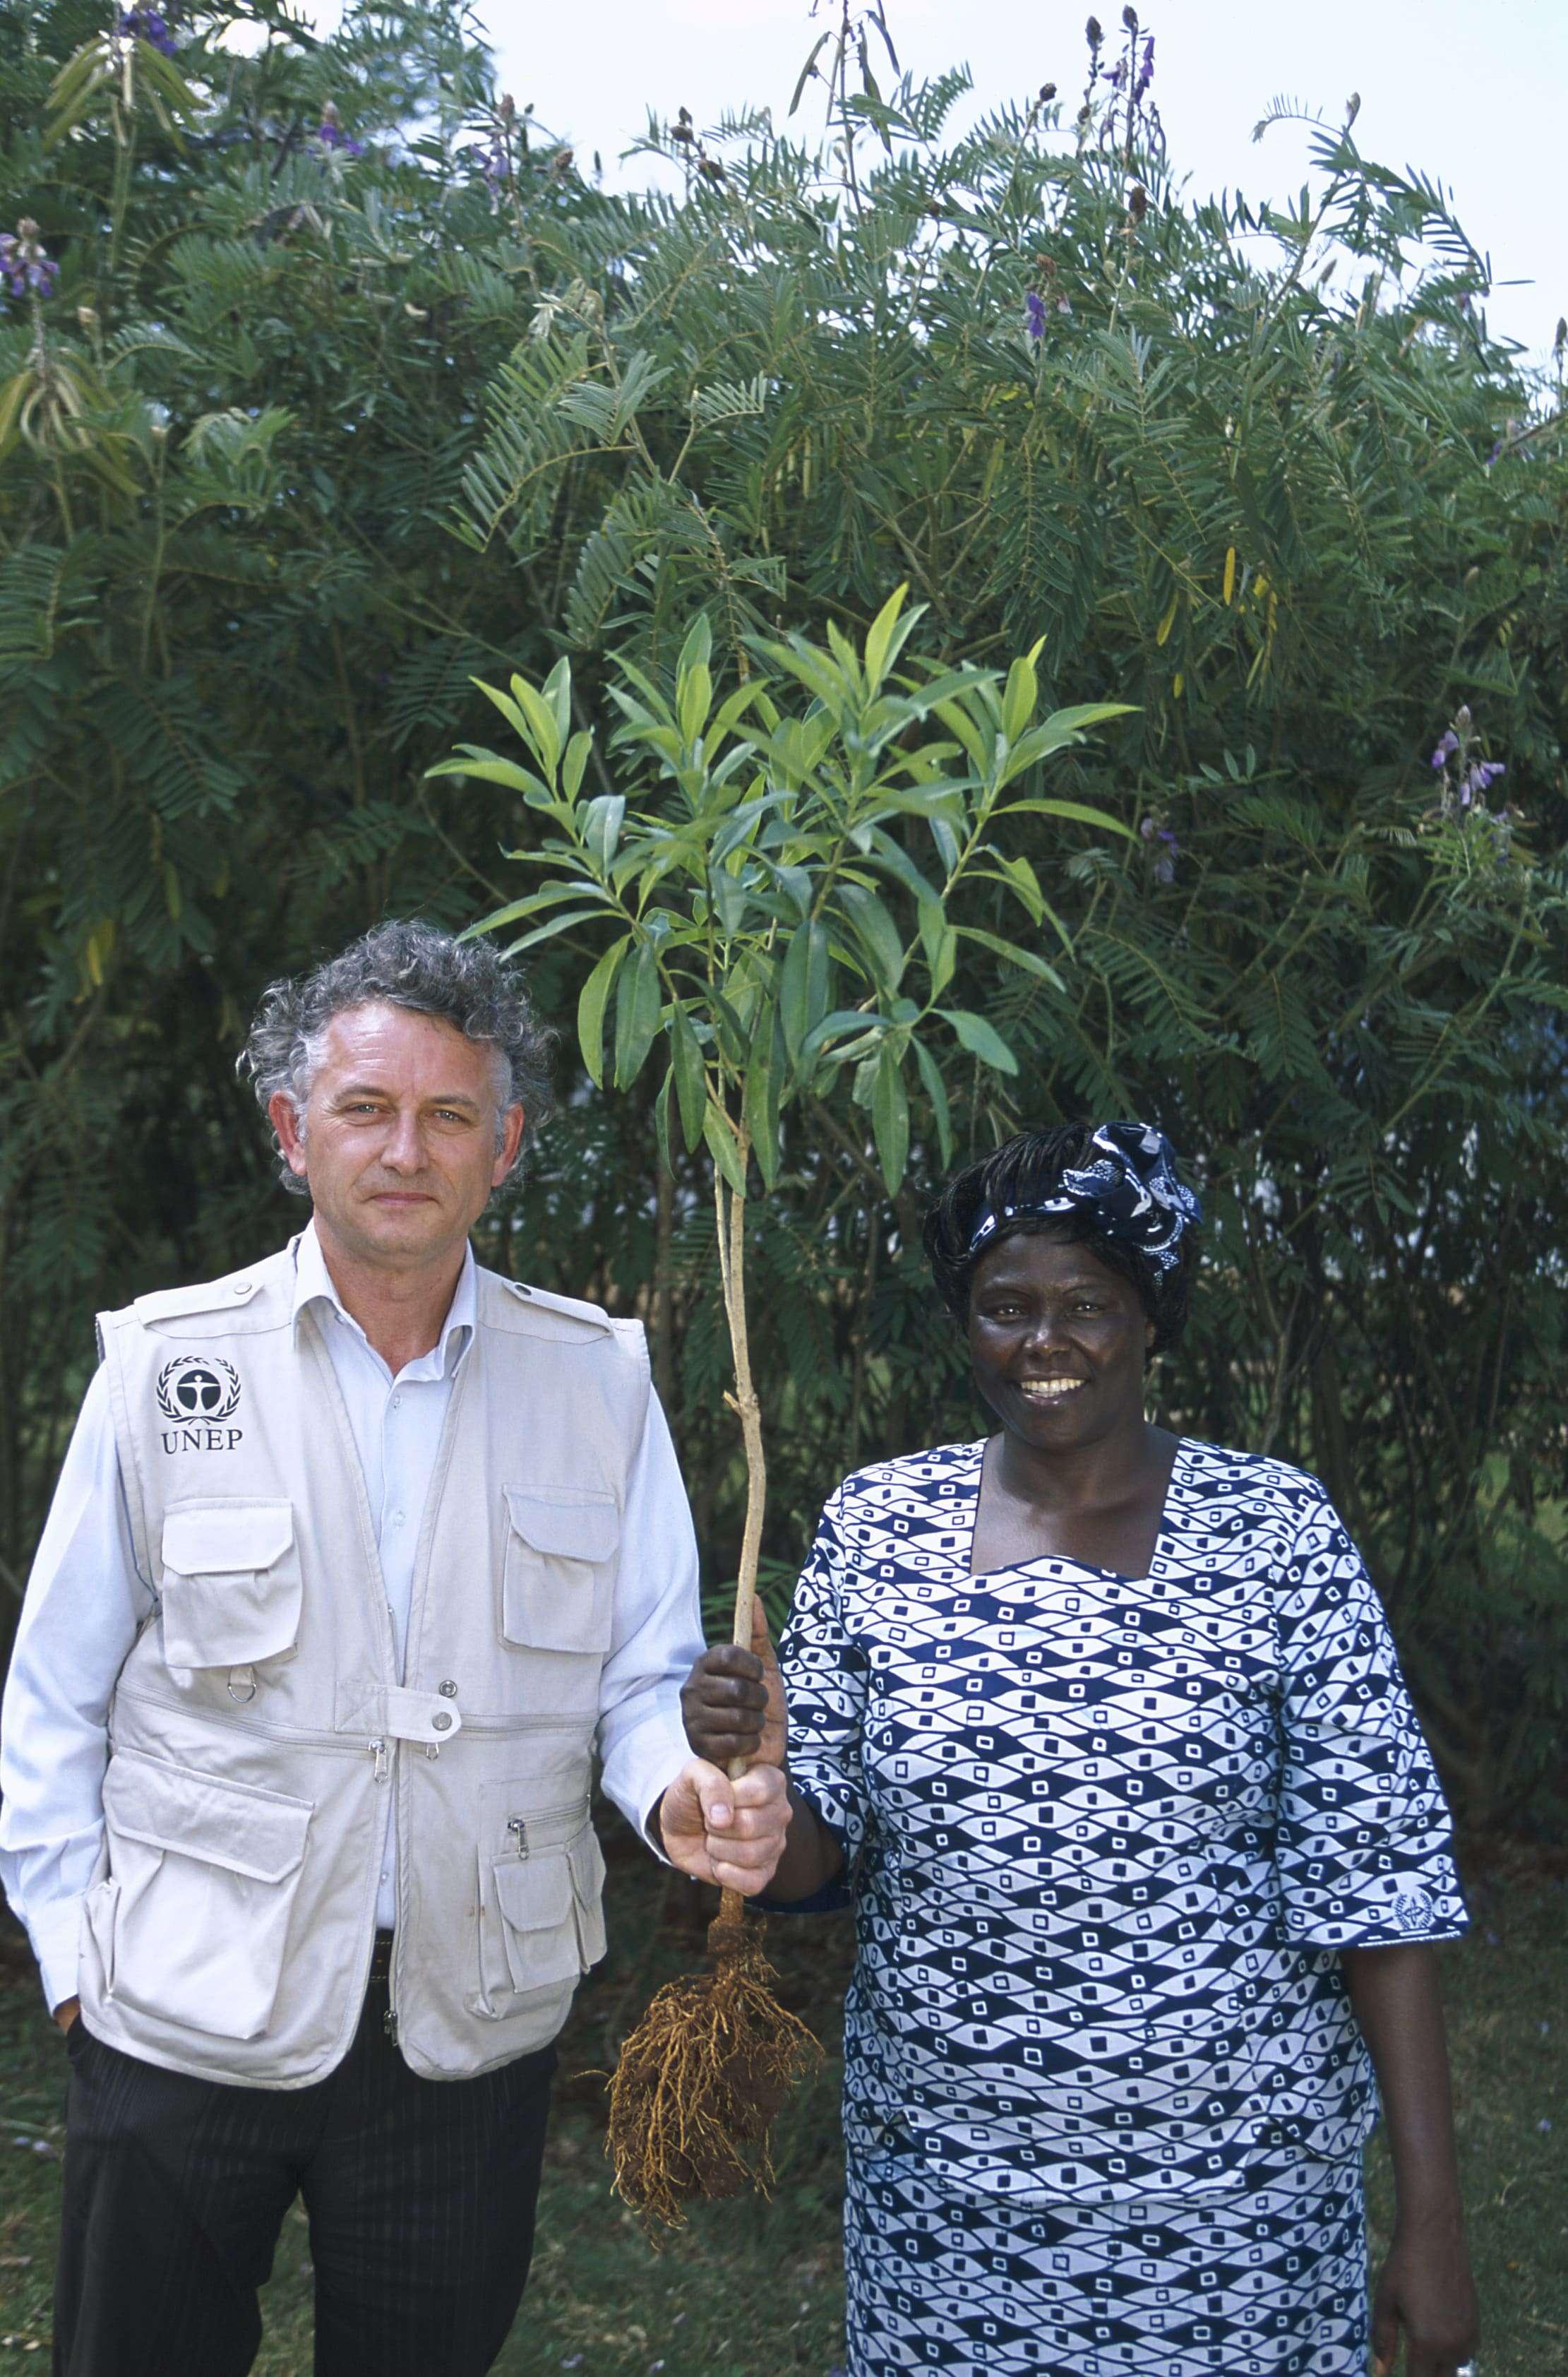 Jacques Rocher and Wangari Maathai